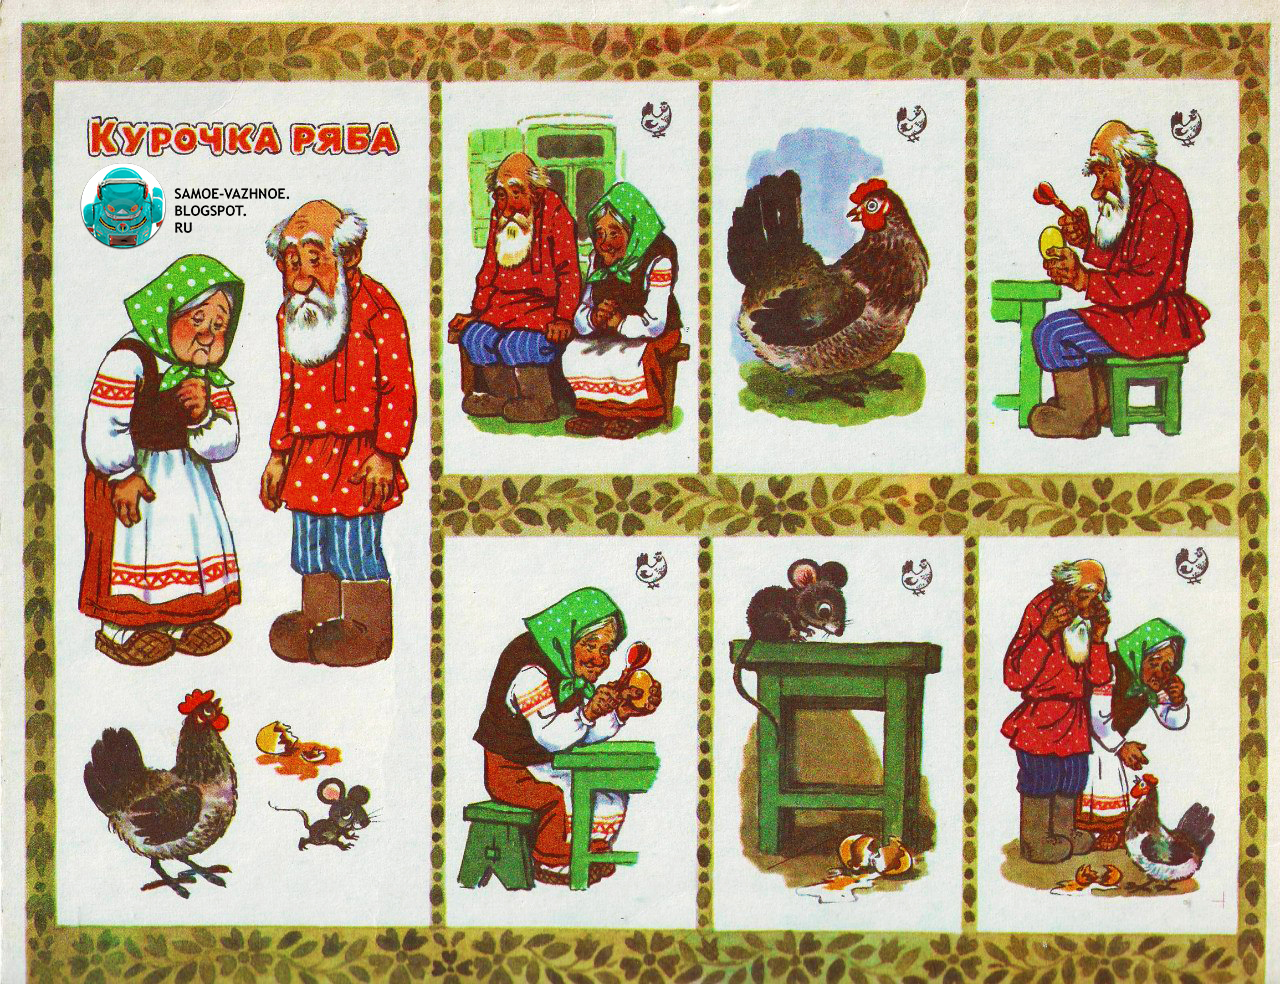 Игра Курочка Ряба СССР